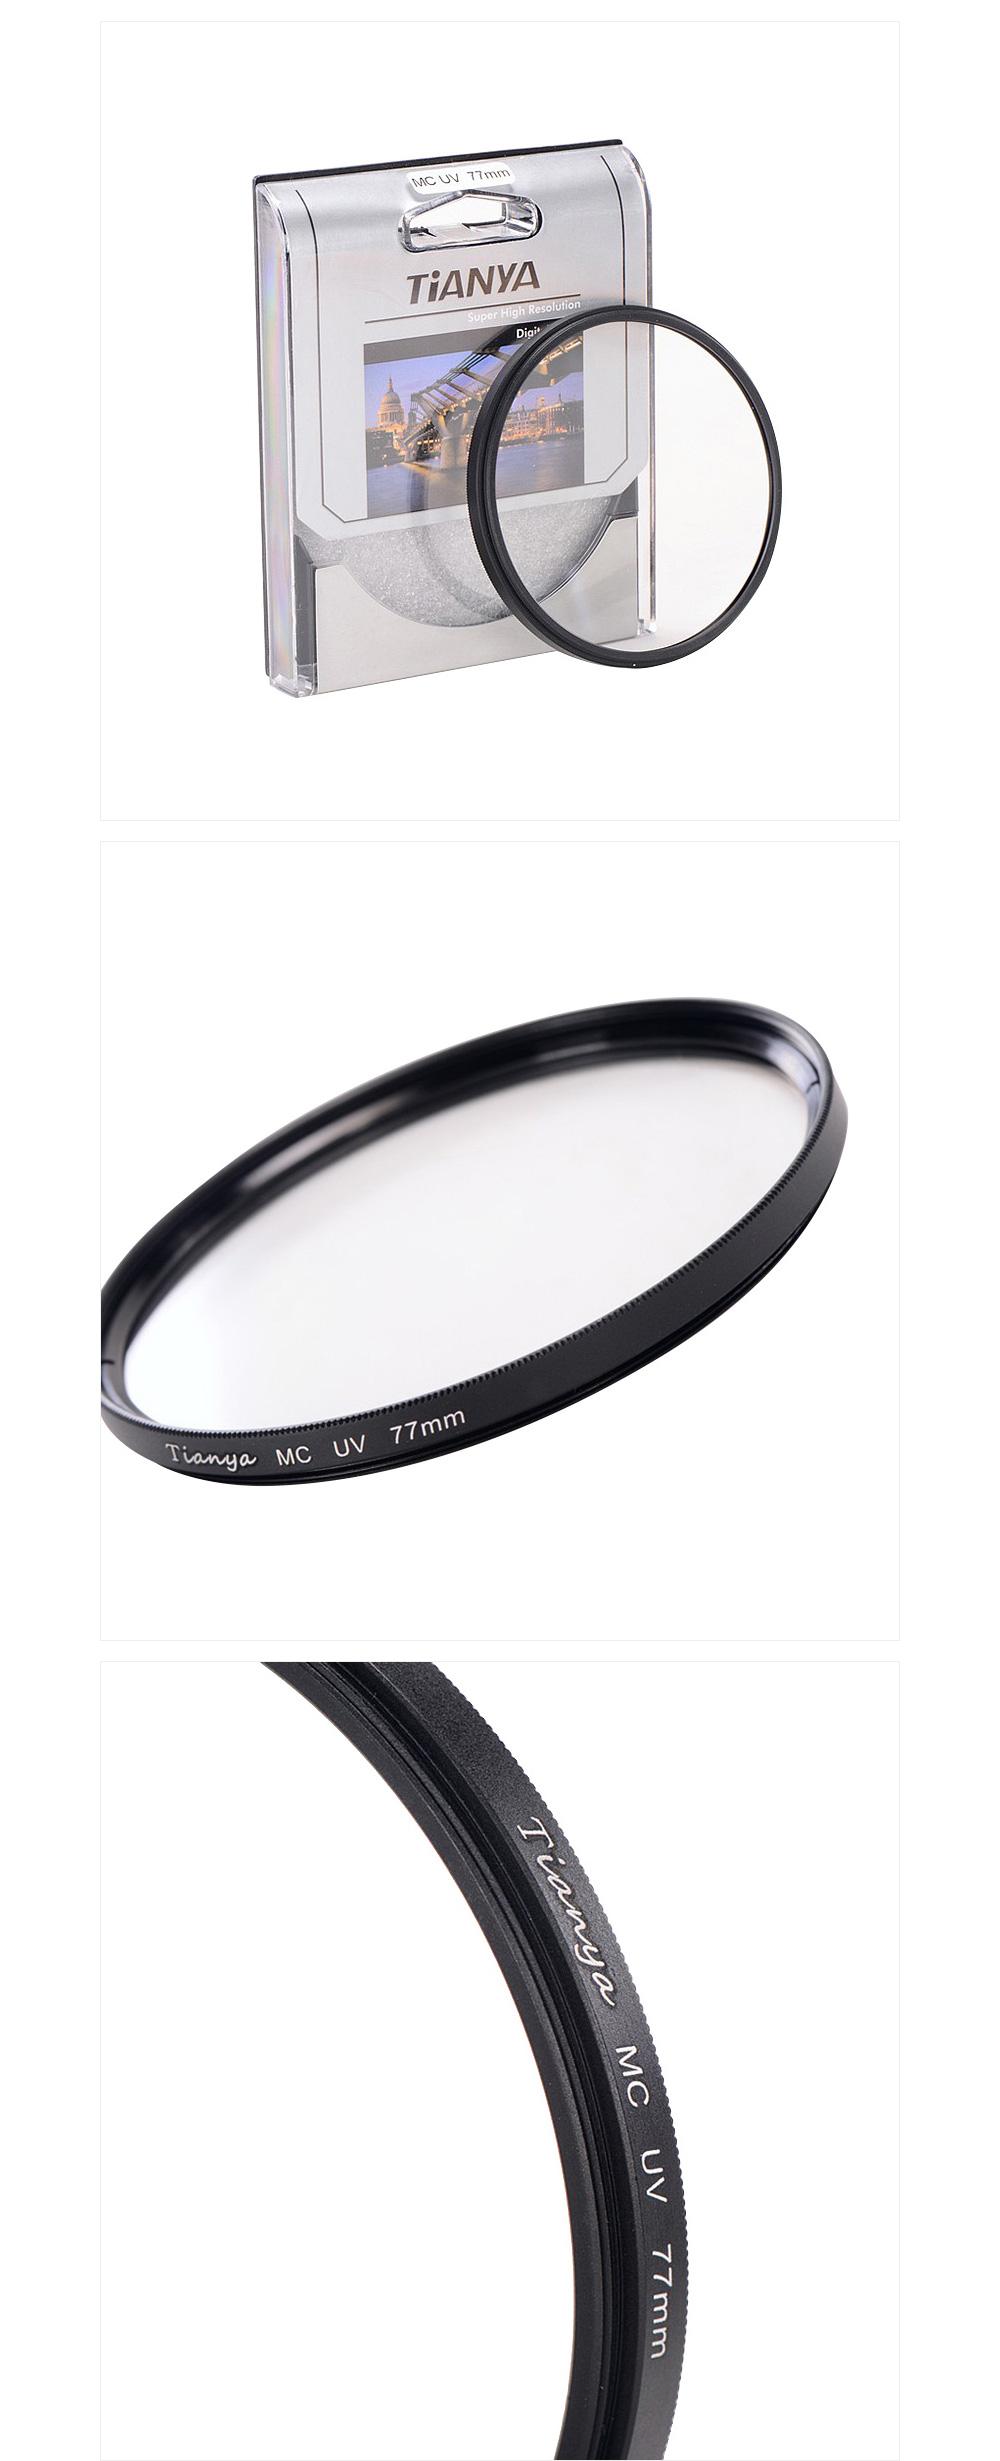 tianya uv filter MCUV filter 37 40.5 43 46 49 52 58 62 67 77 82 86mm mcuv 4-layer coating filters for nikon canon camera lens 2